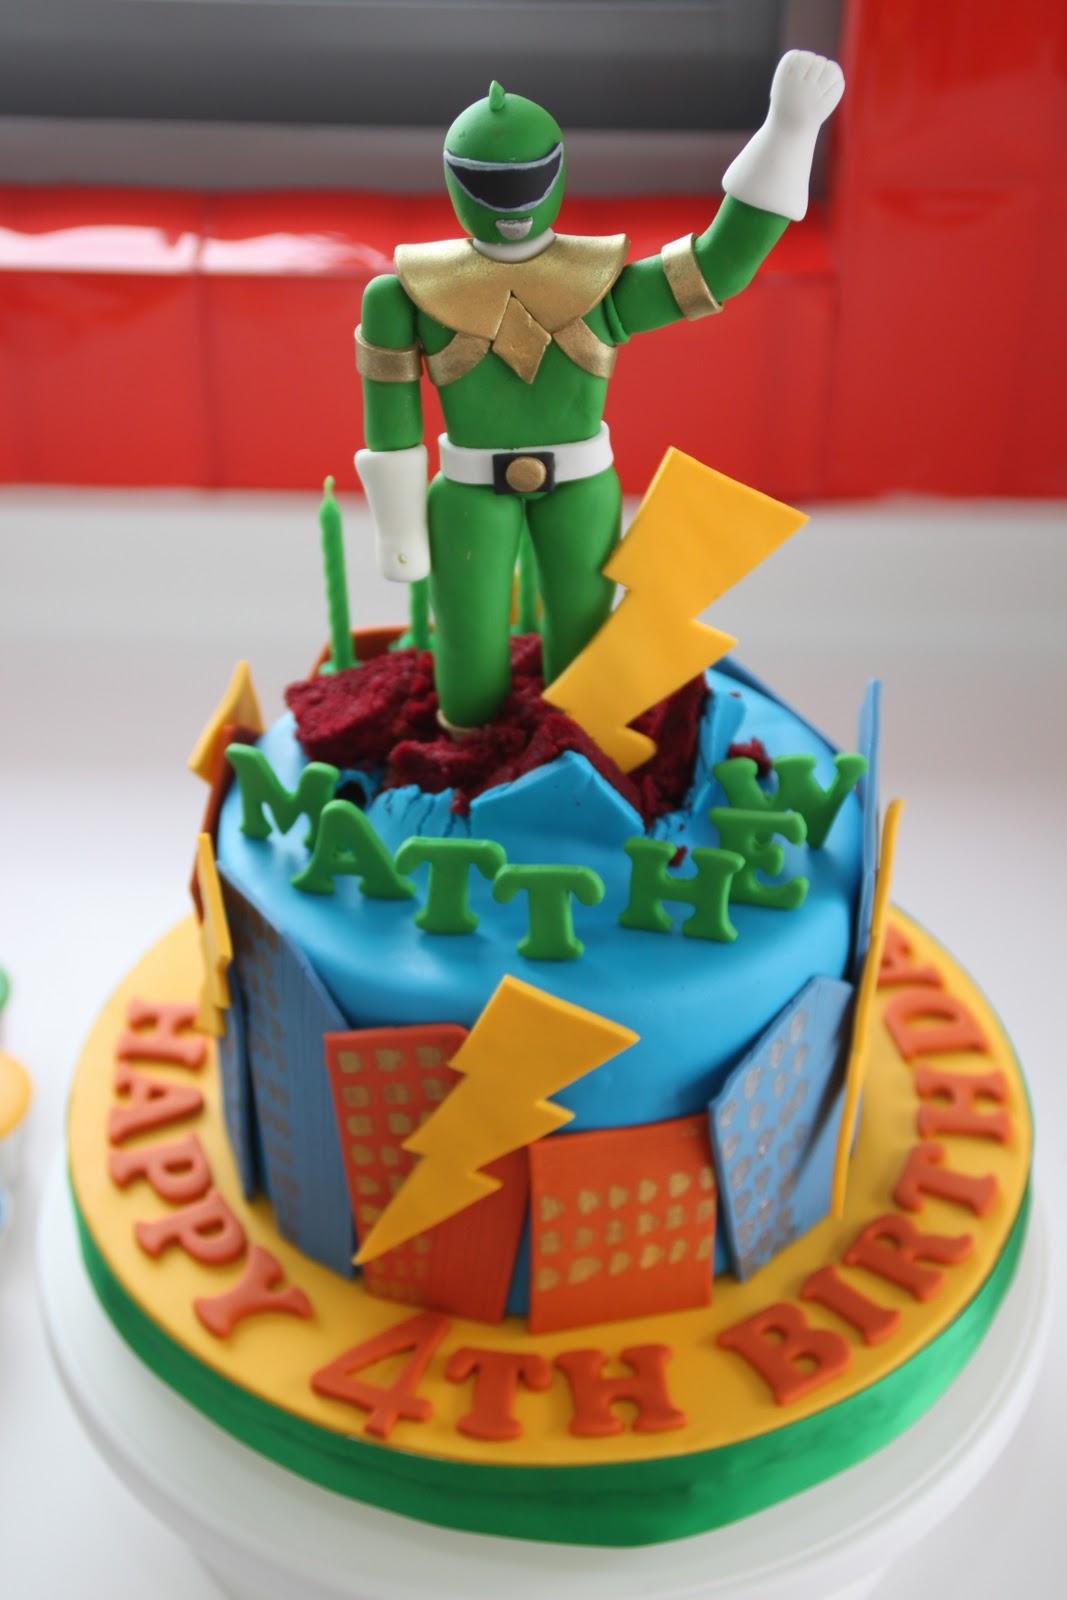 Astonishing Power Ranger Cakes Decoration Ideas Little Birthday Cakes Personalised Birthday Cards Veneteletsinfo